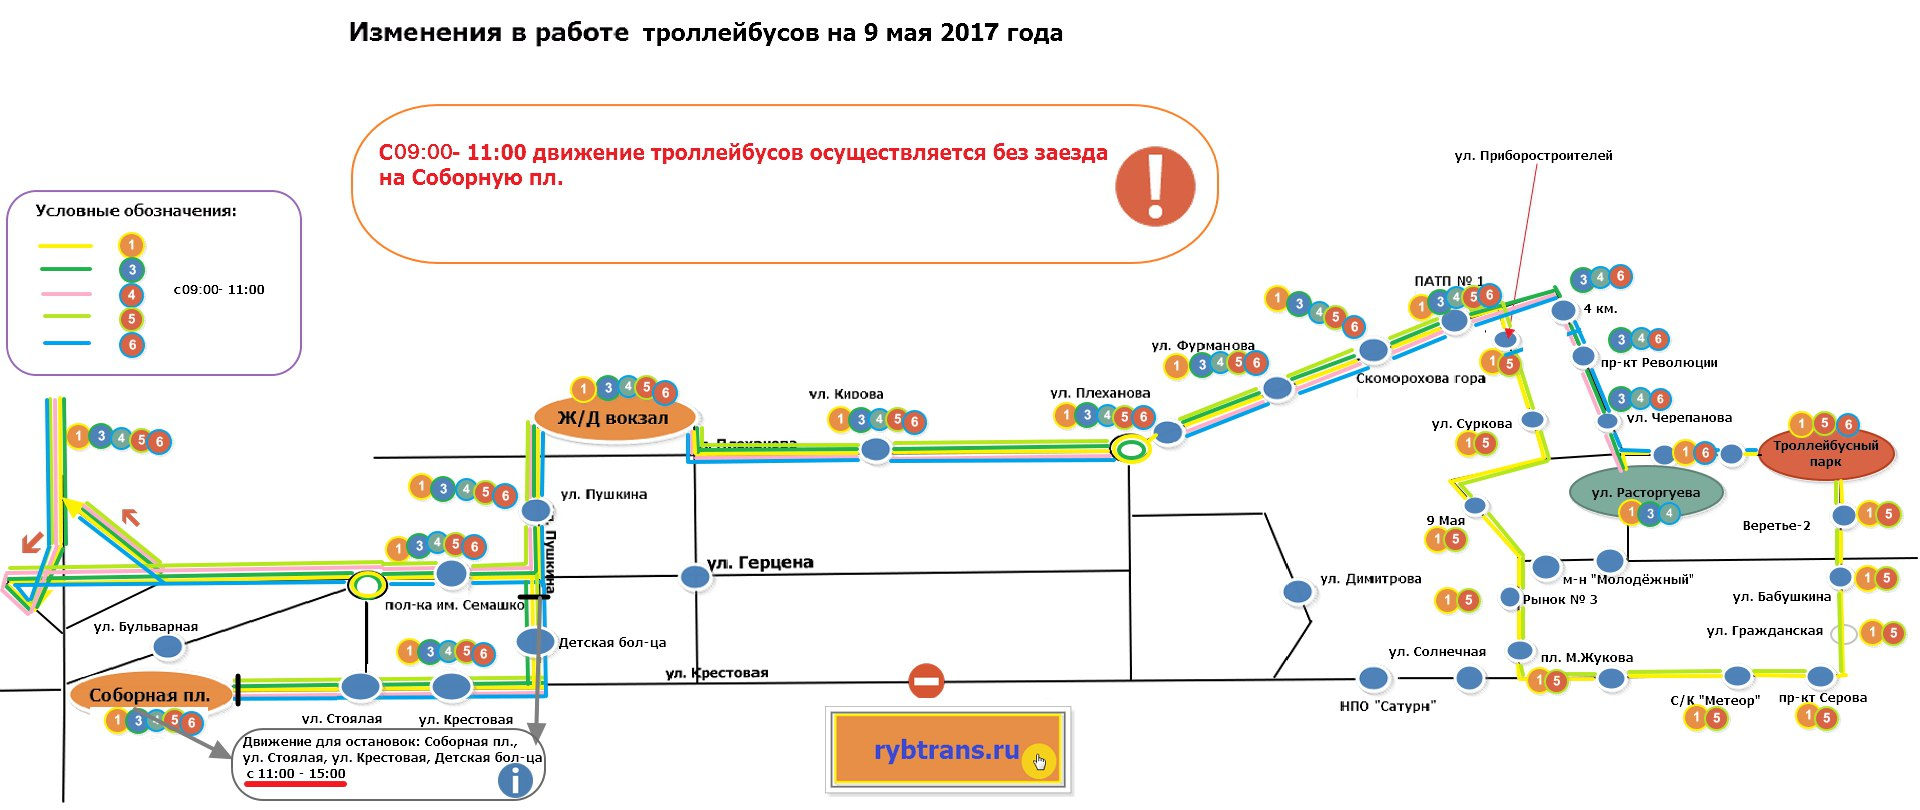 Схема объезда. Троллейбусы